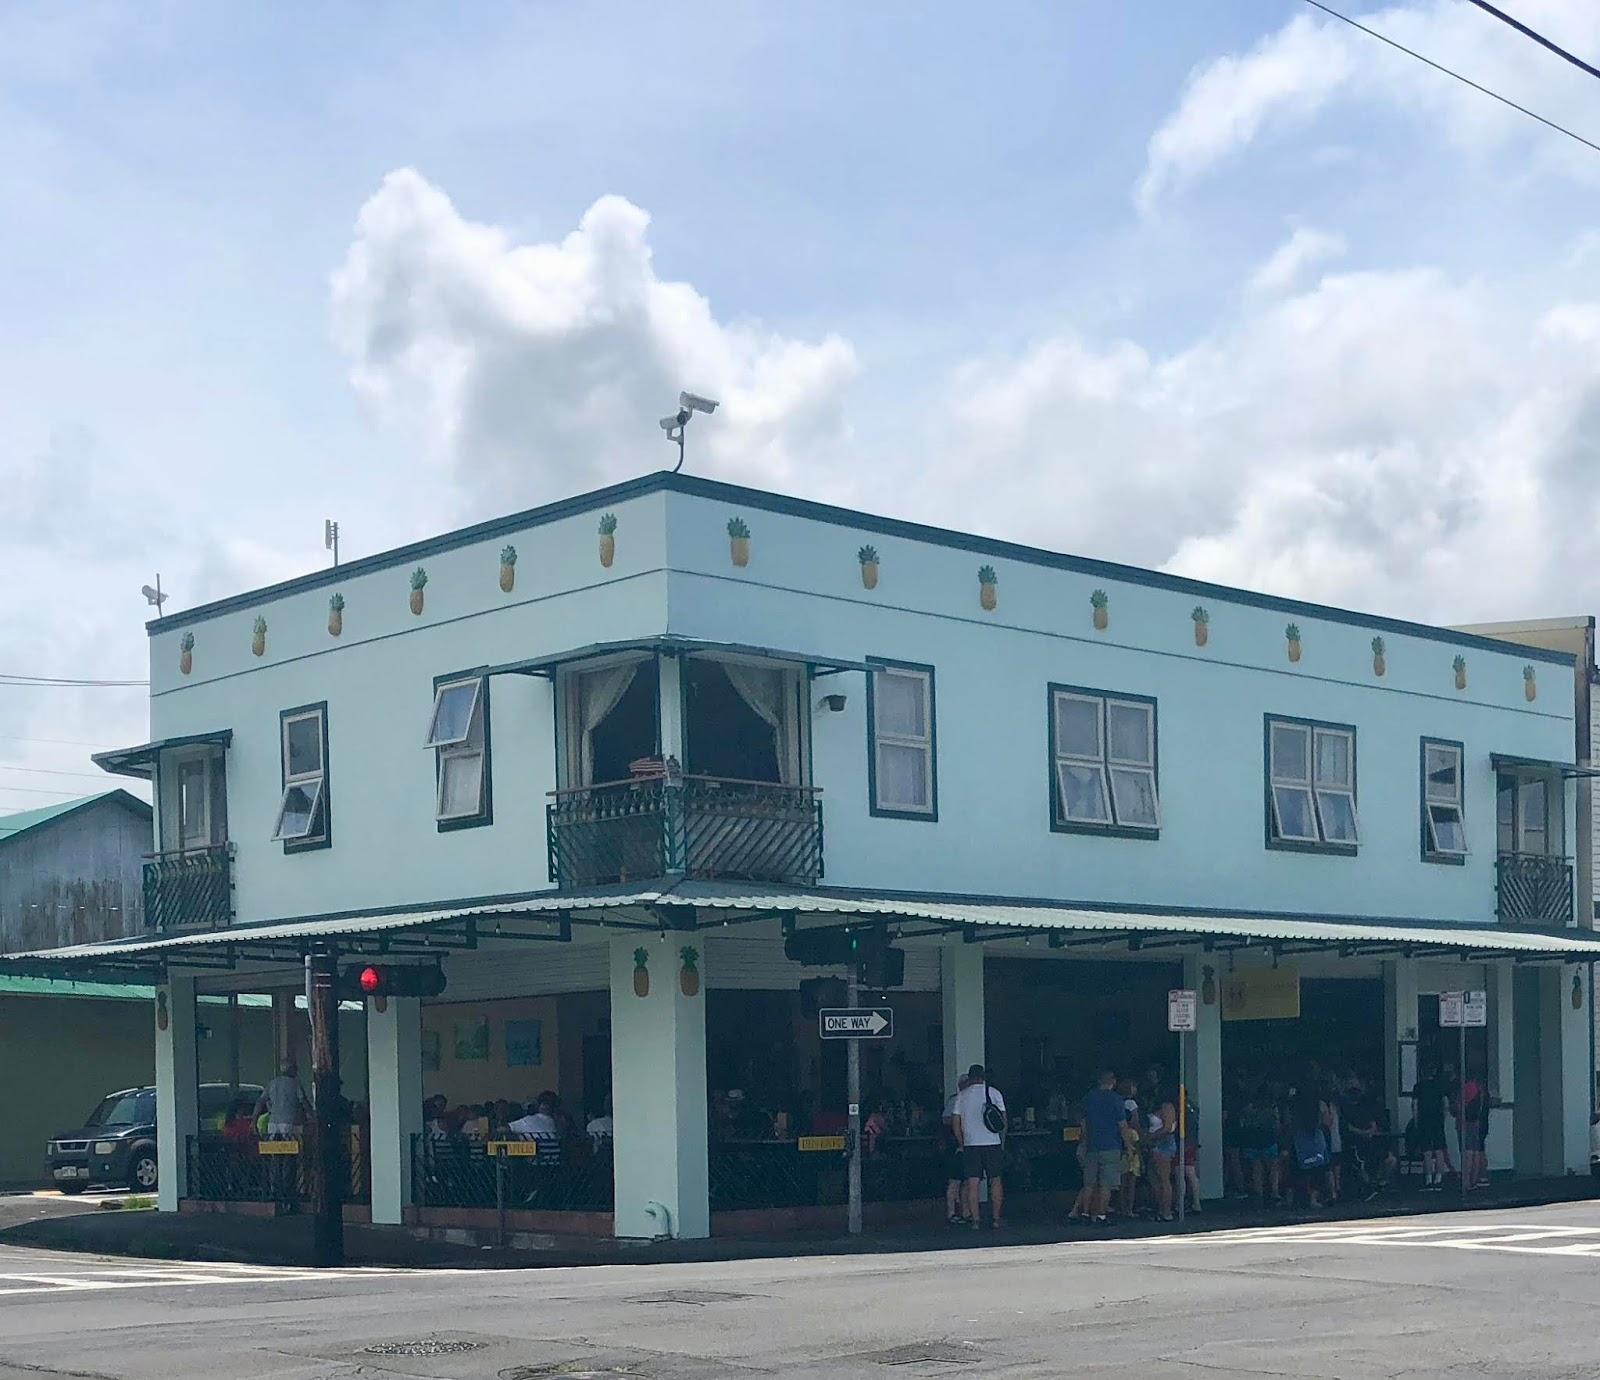 TASTE OF HAWAII: PINEAPPLES RESTAURANT